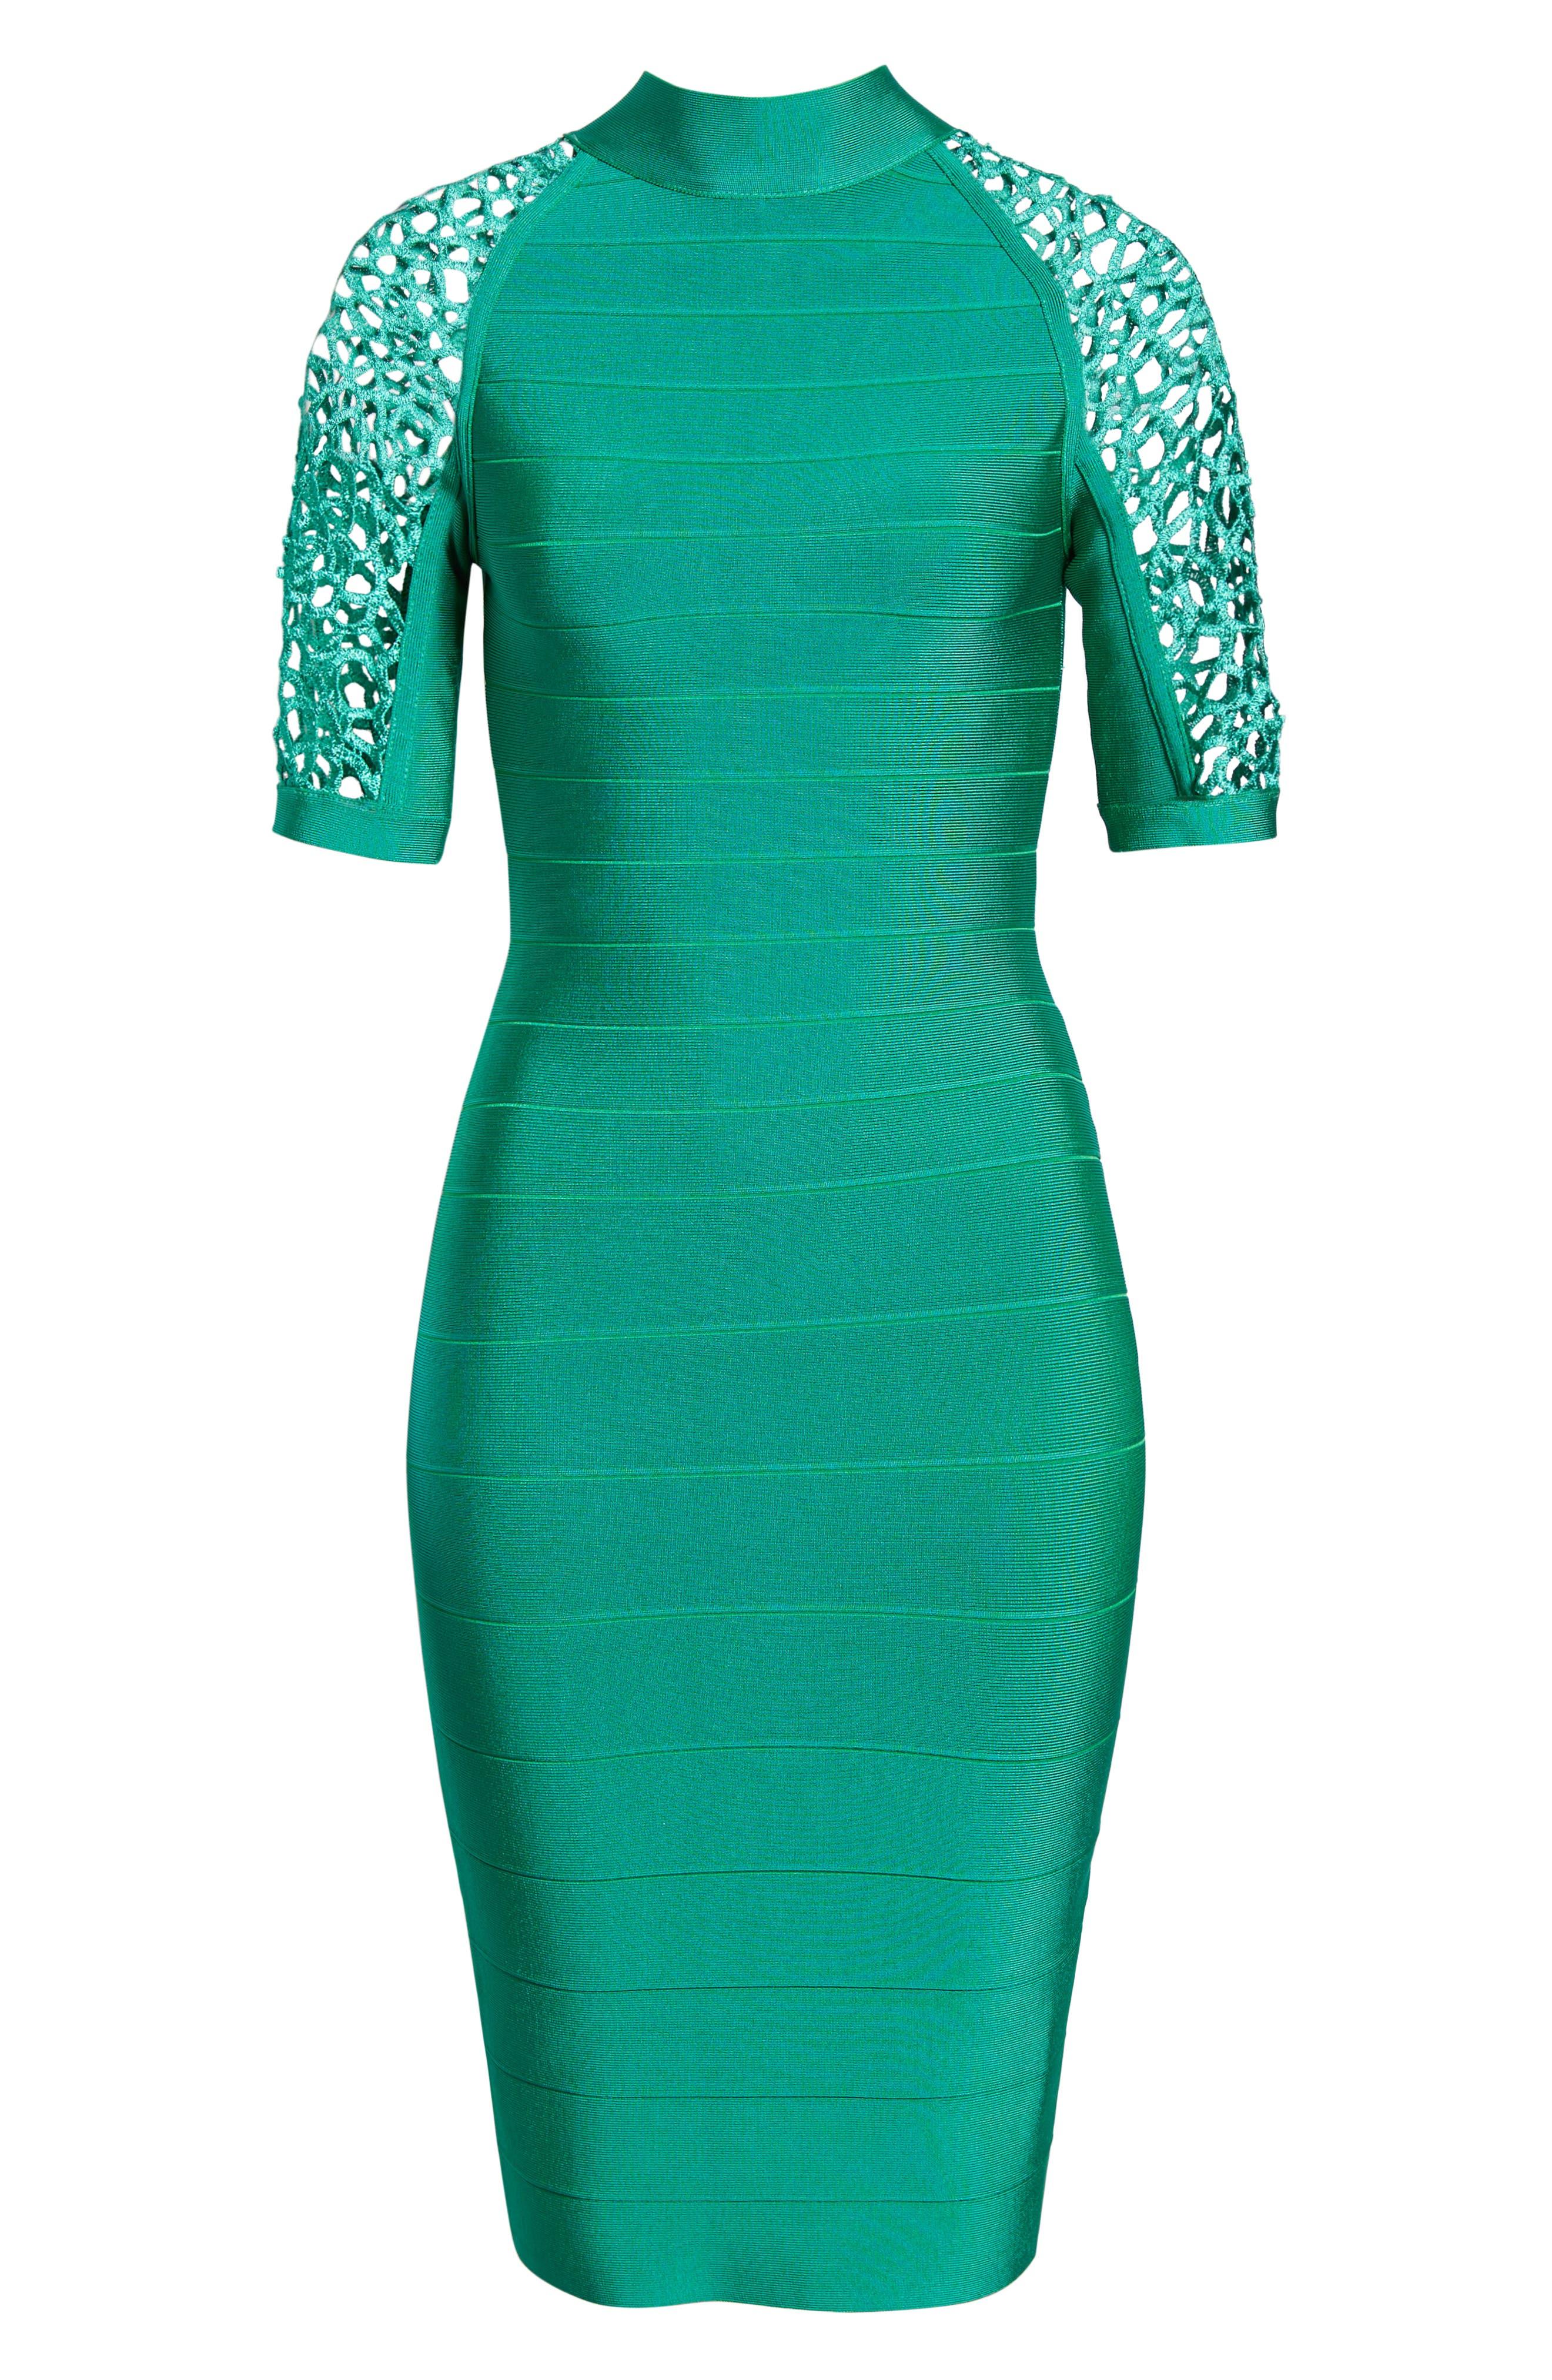 SENTIMENTAL NY,                             Bandage Body-Con Dress,                             Alternate thumbnail 7, color,                             GREEN